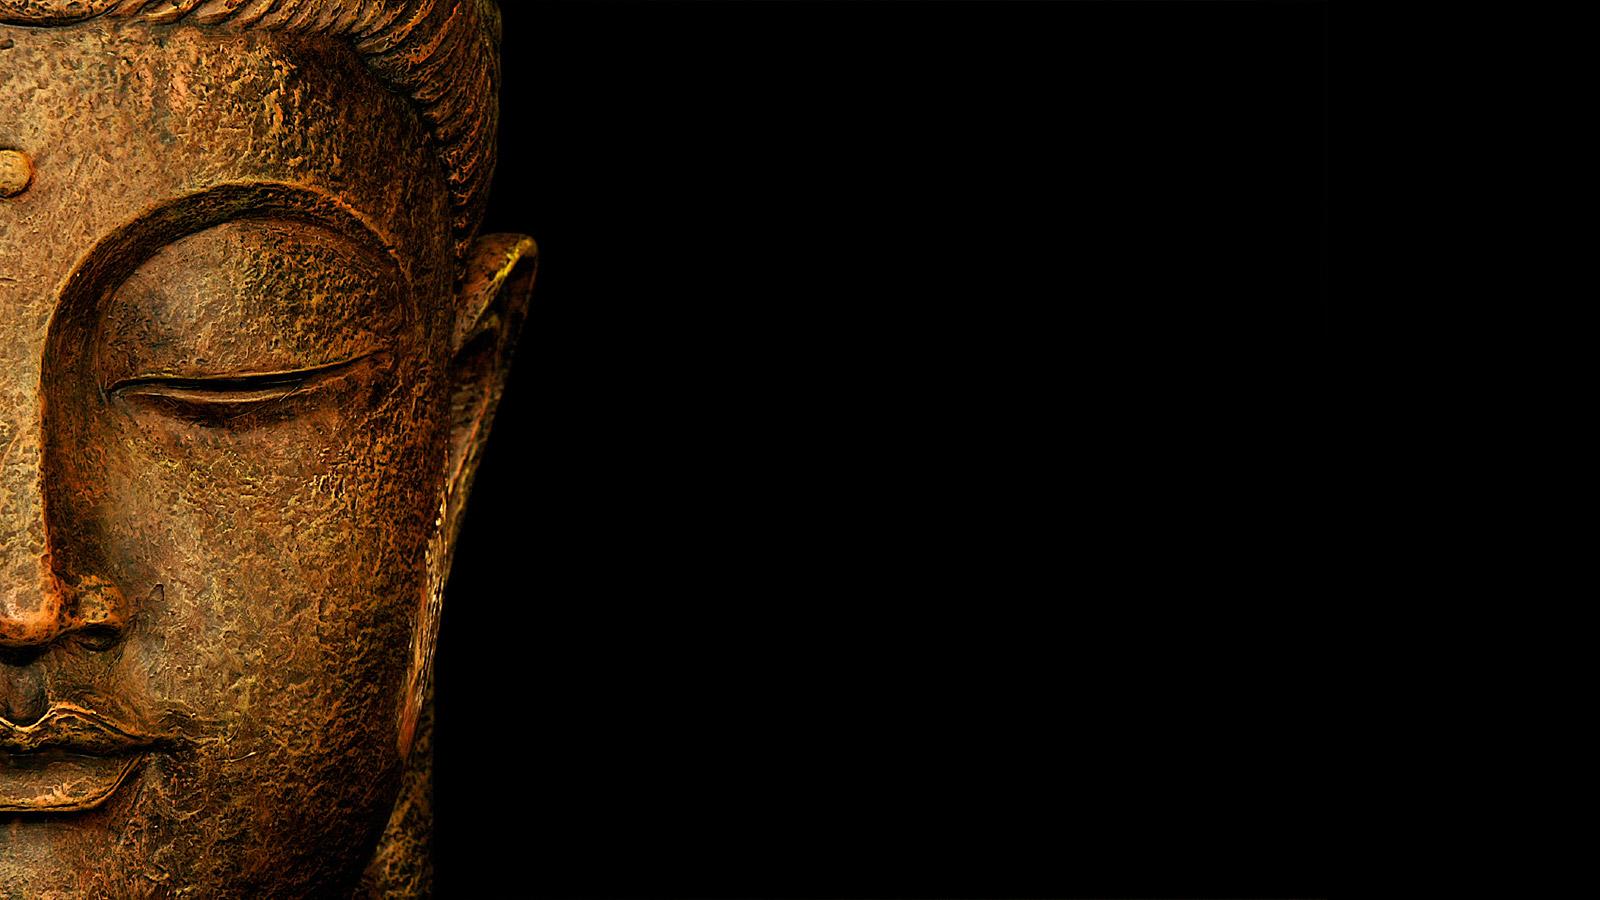 Buddha Siddhartha Gotama Awareness And Meditation Wallpaper Zentao 1600x900